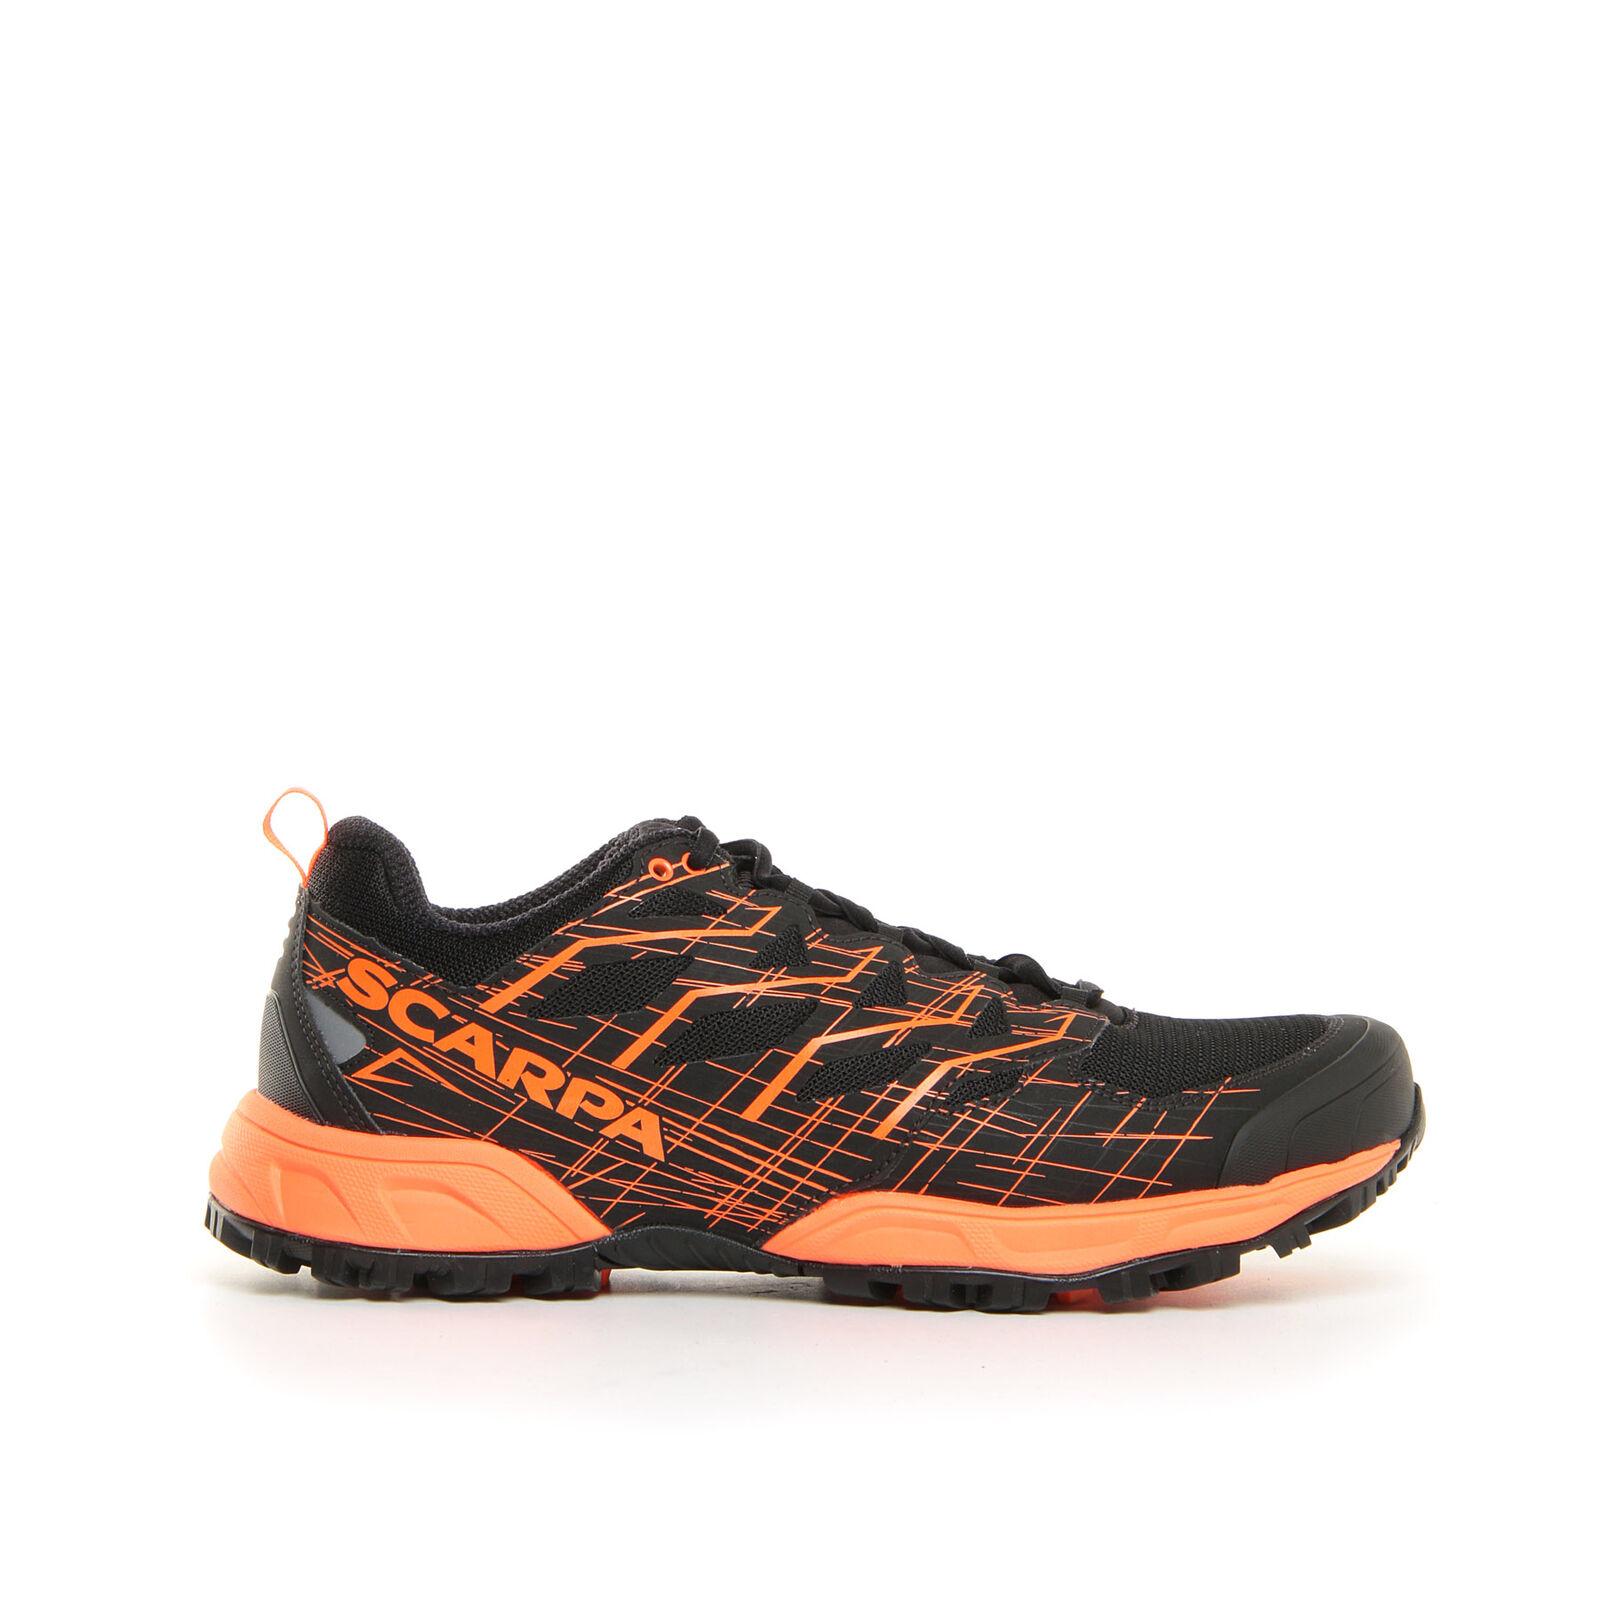 SCARPA NEUTRON 2 shoes TRAIL RUNNING men 33036 350